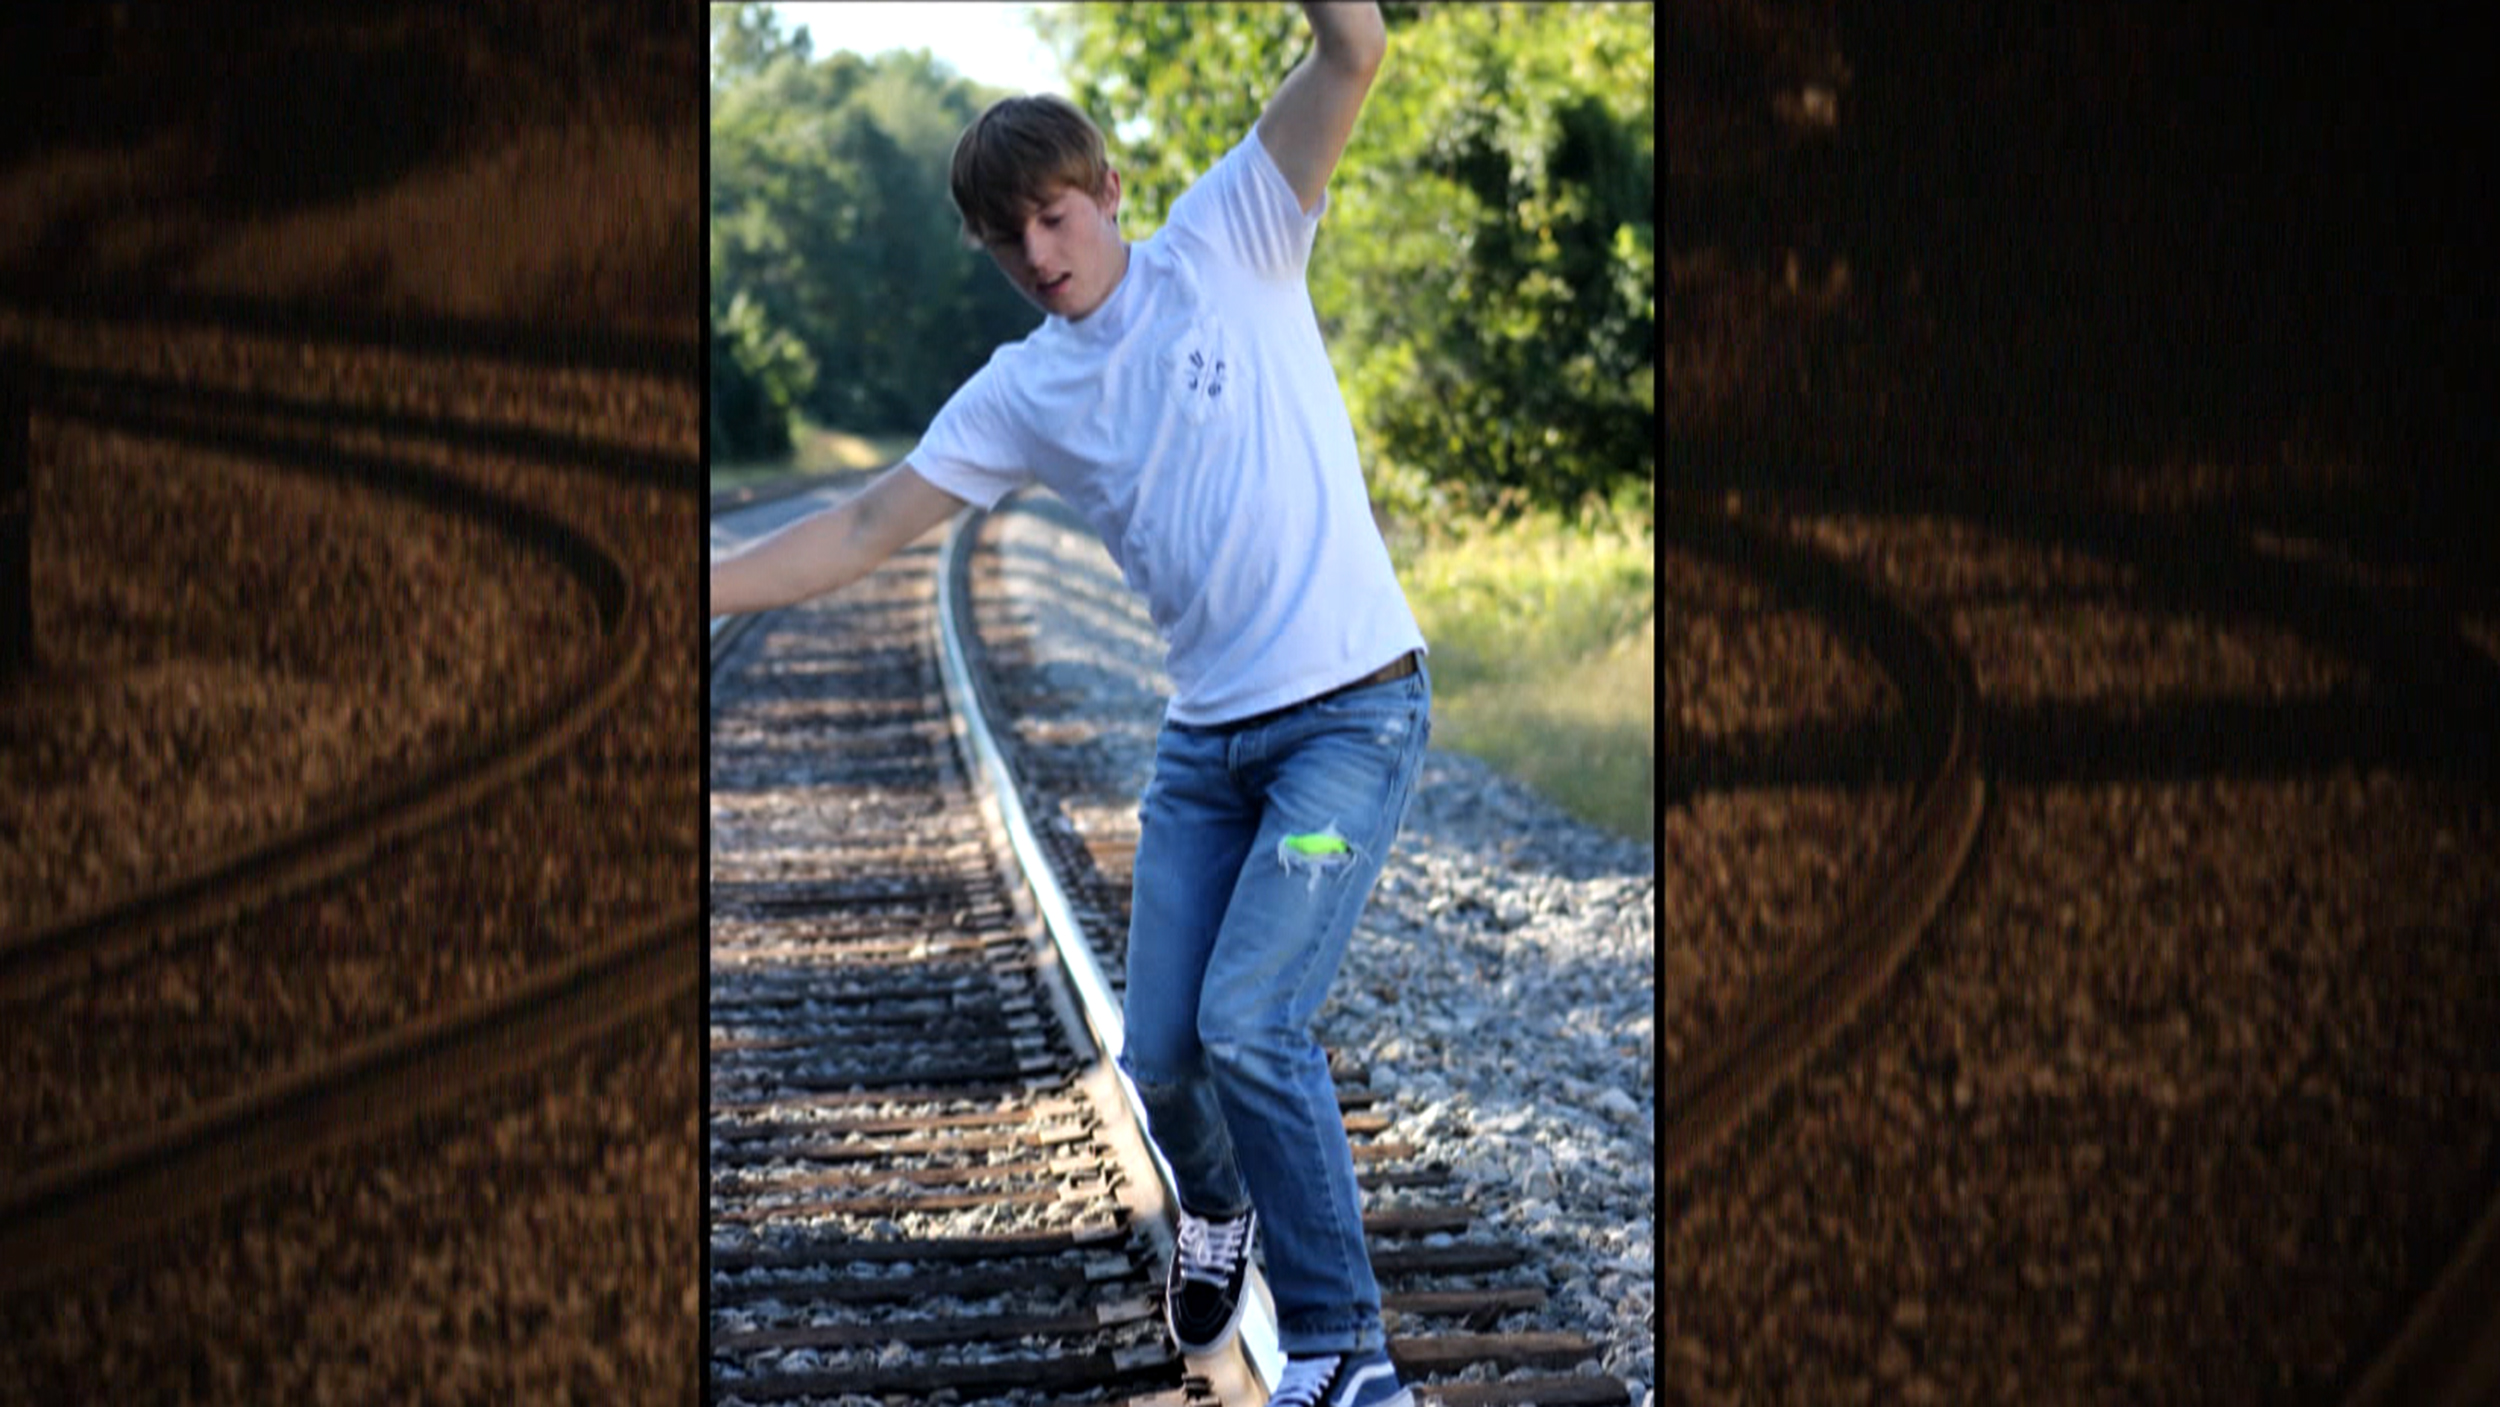 Taking Selfies On Train Tracks Dangerous New Trend Is